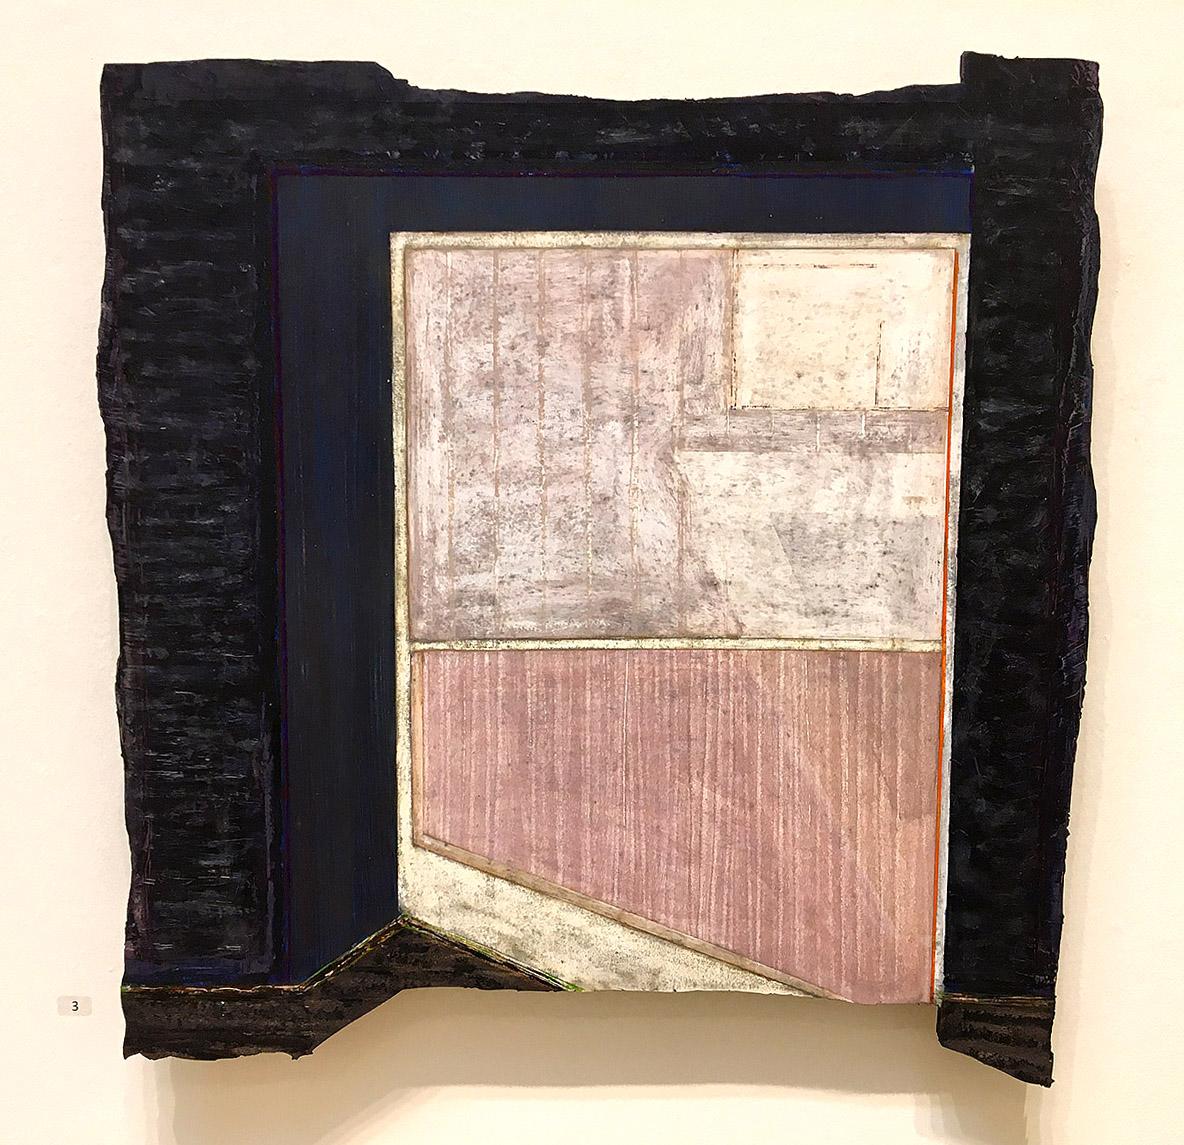 Naomi McClure, Gray's School of Art